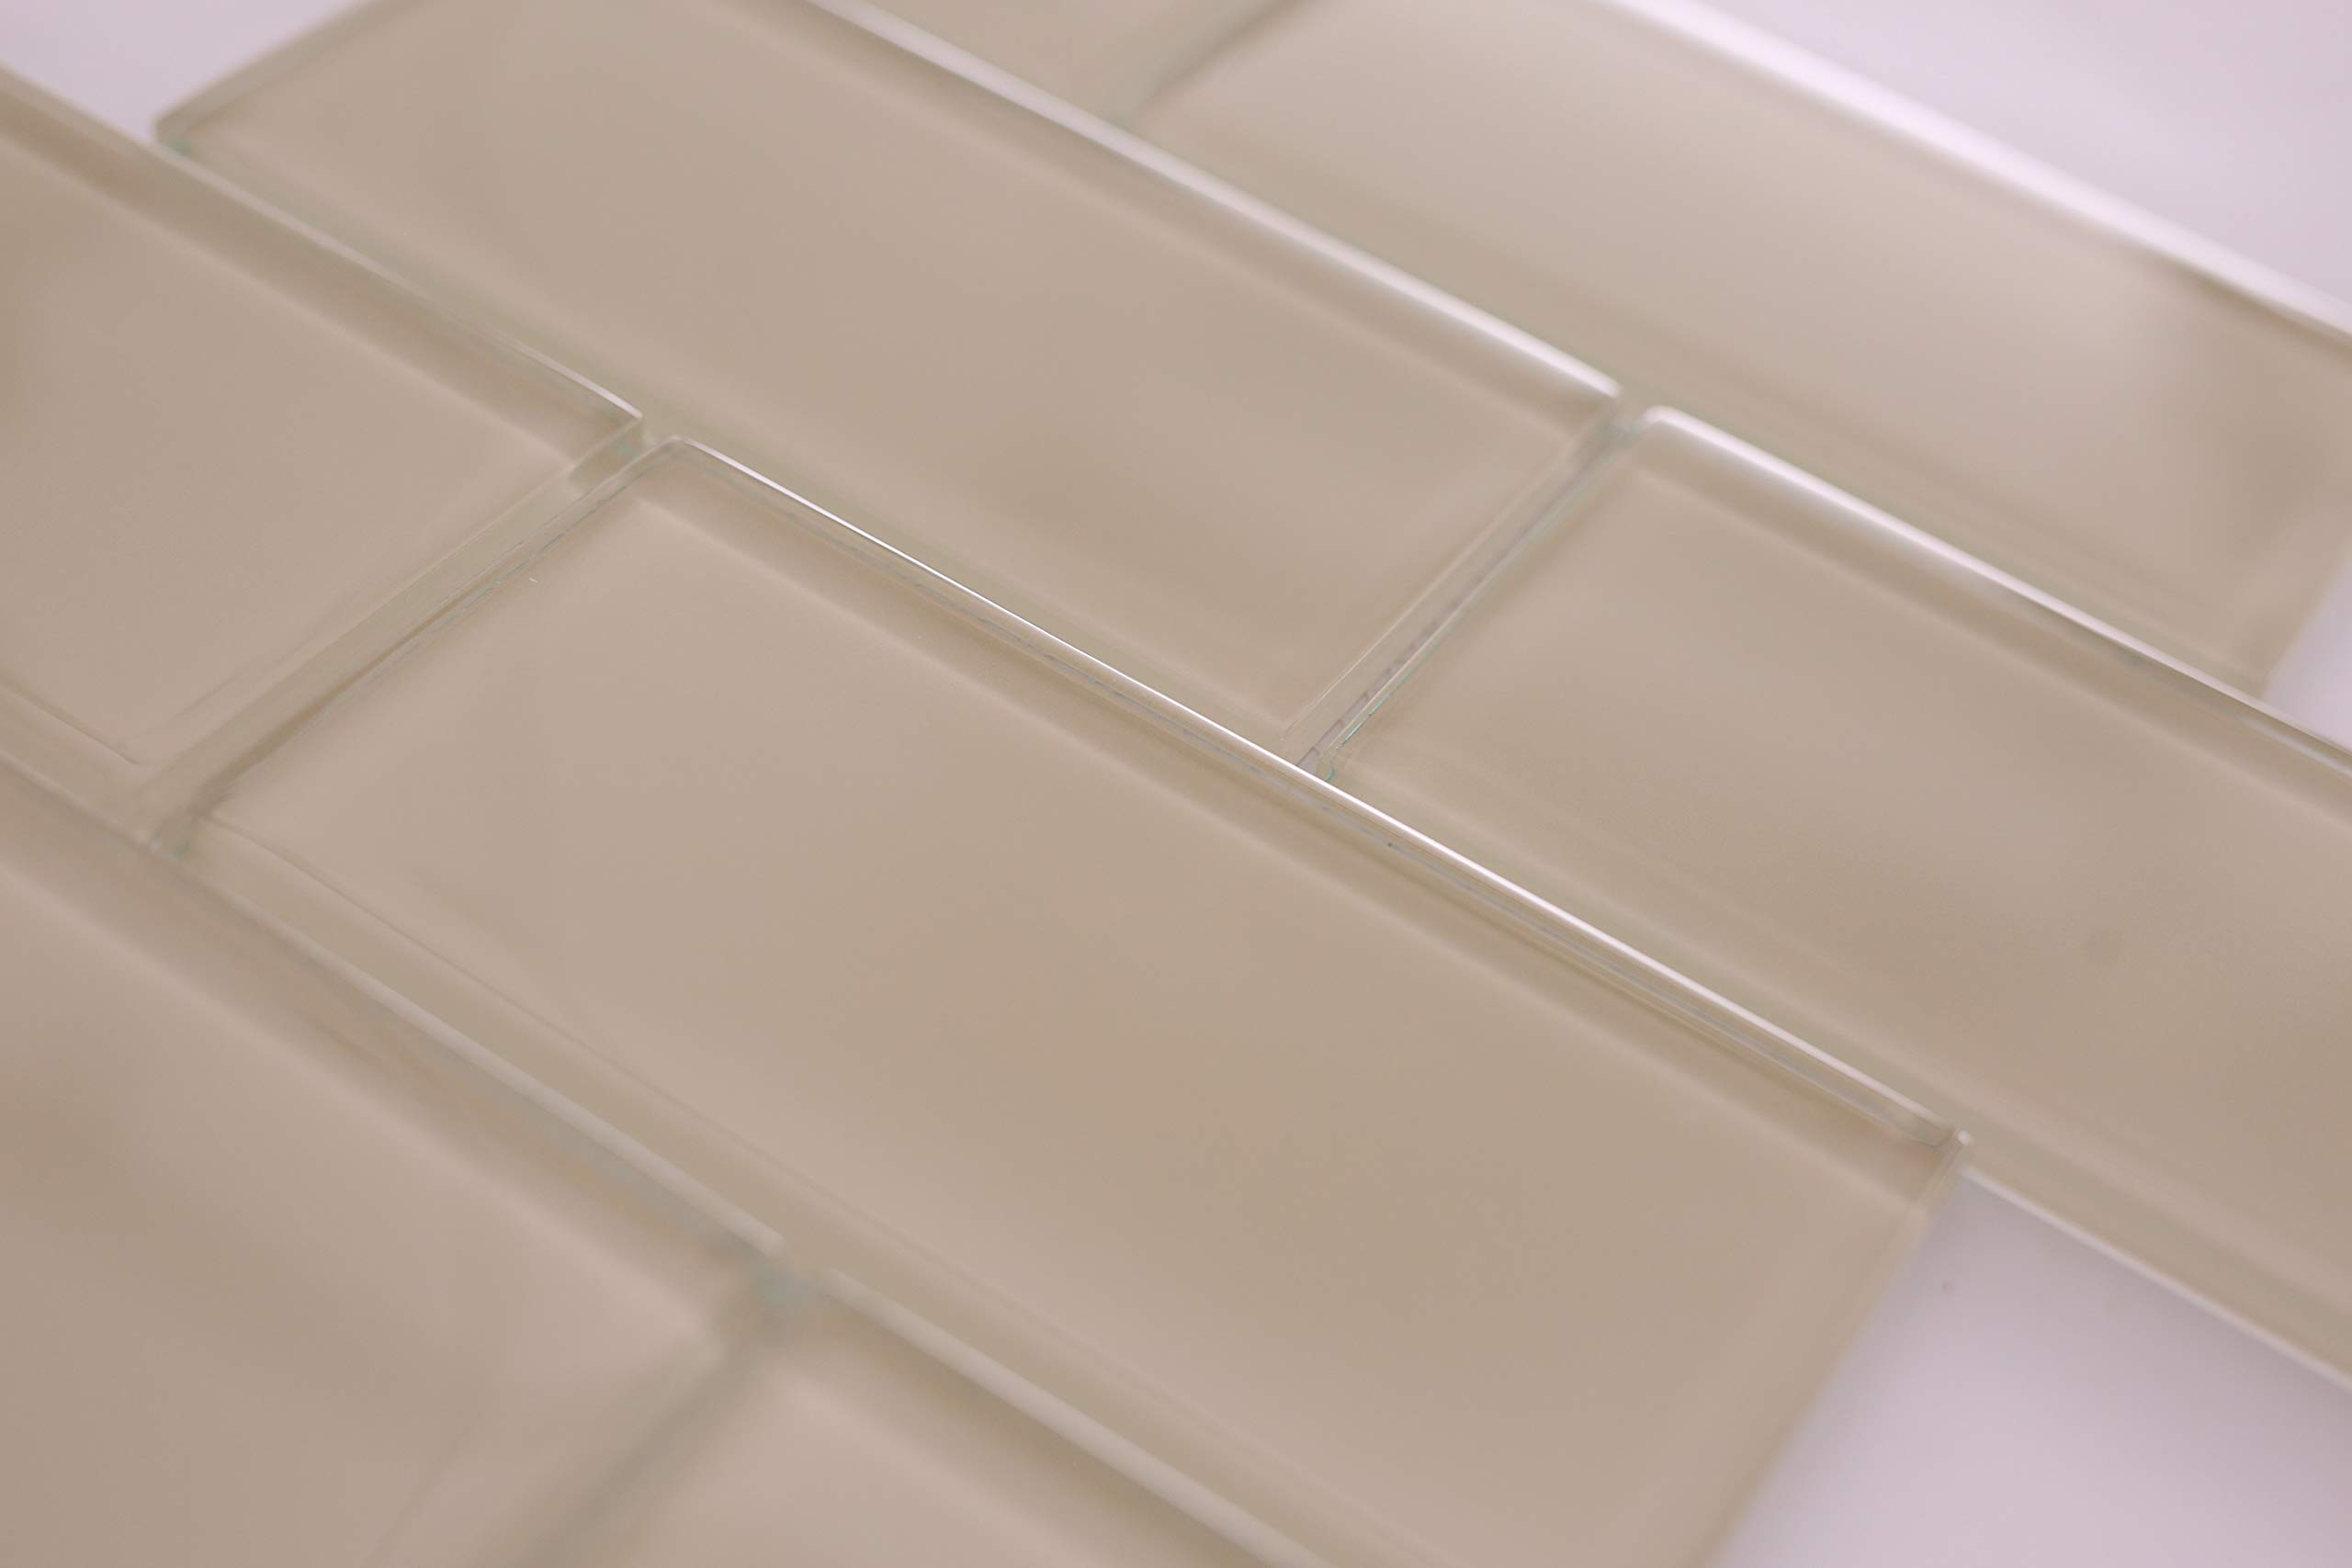 Crystalcor USA : 3x6 Brick Glass Subway Tile Backsplash Light Beige for Kitchen Bathroom Shower 12 in x 12 in x 8mm mesh Mounted (5 Square feet)